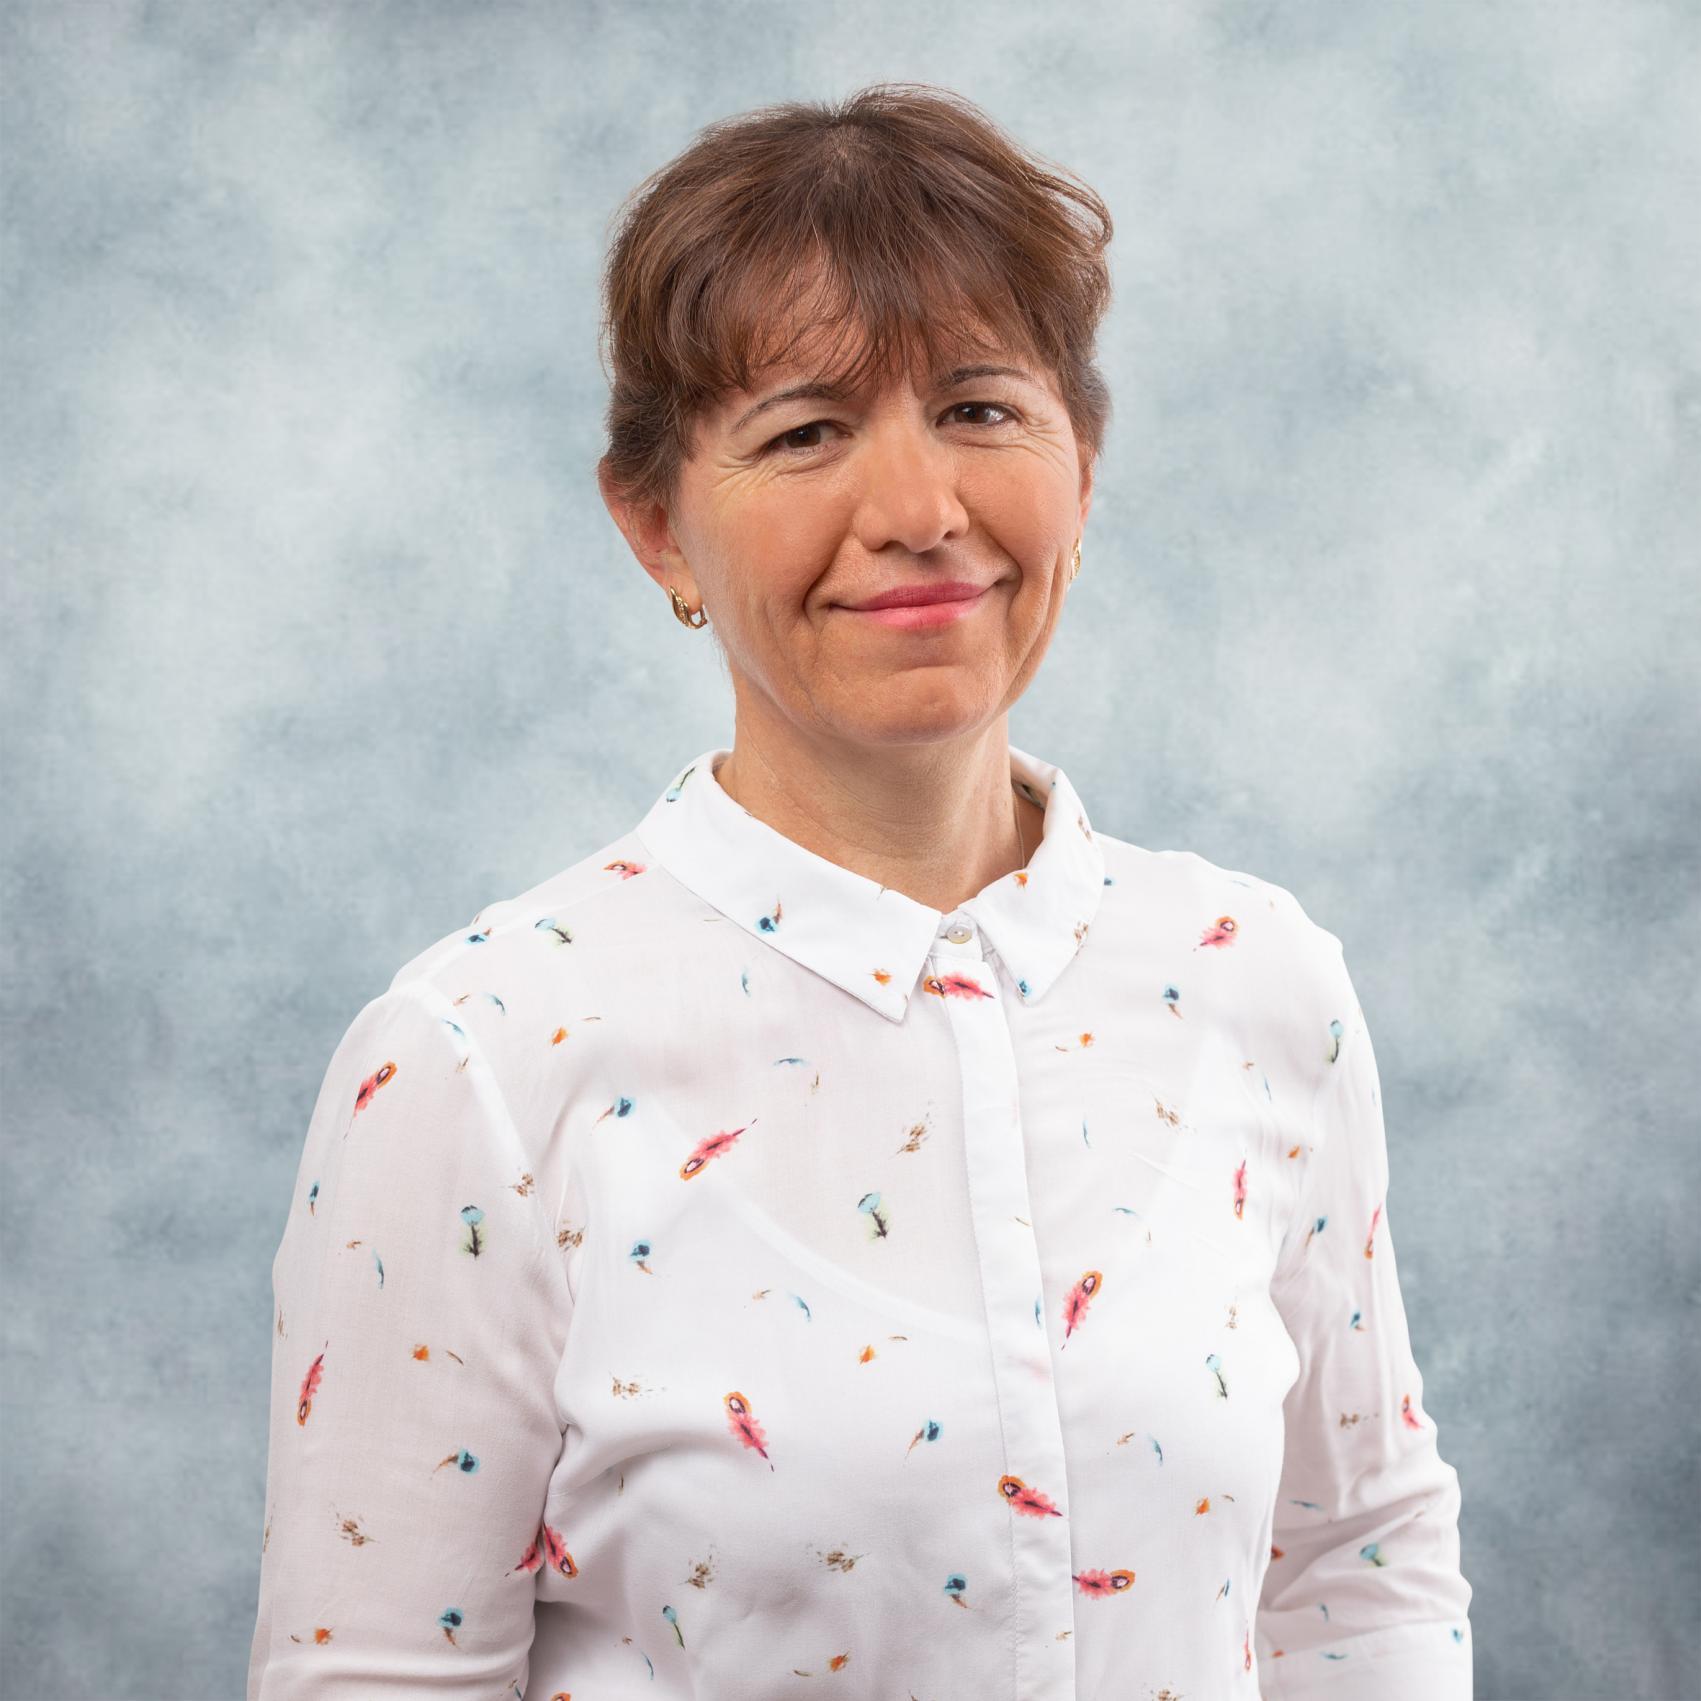 Plamenka Charléty - Strahlentherapie Appenweier